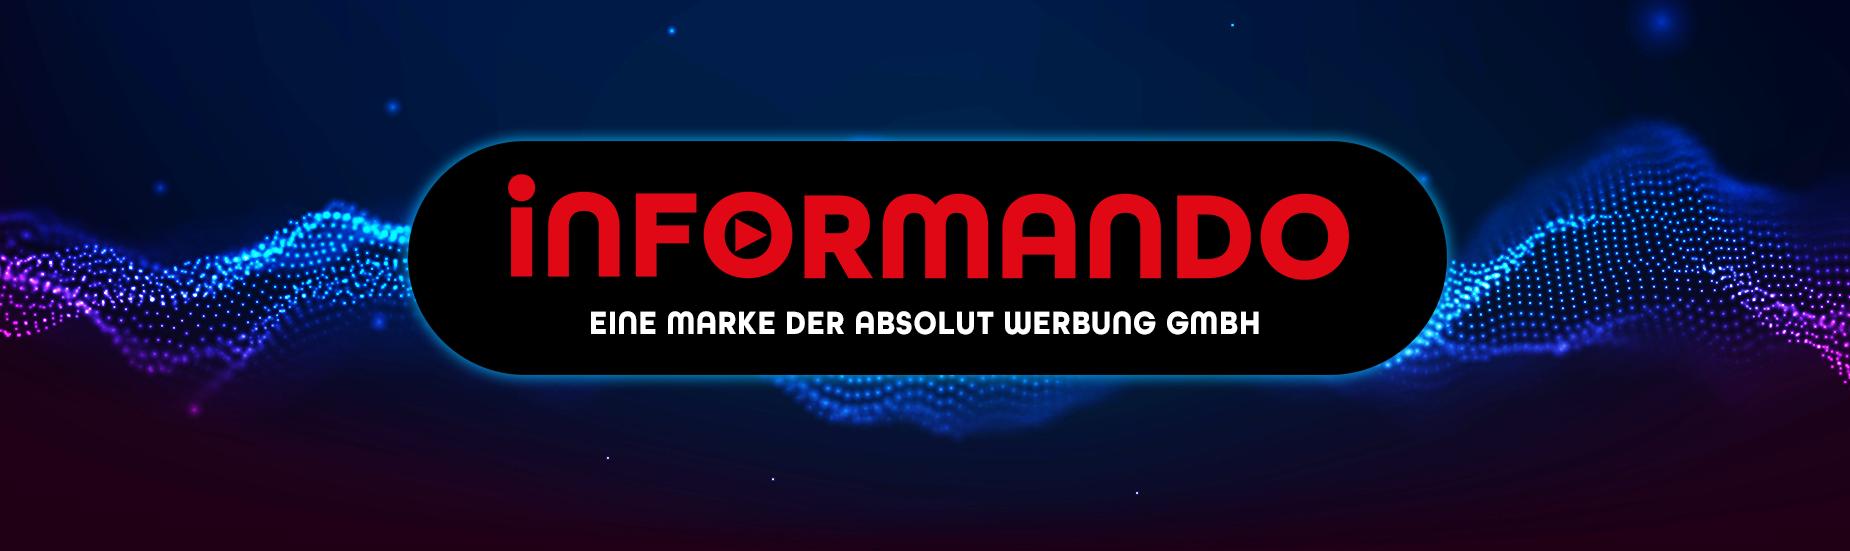 Informando_absolutWebseite